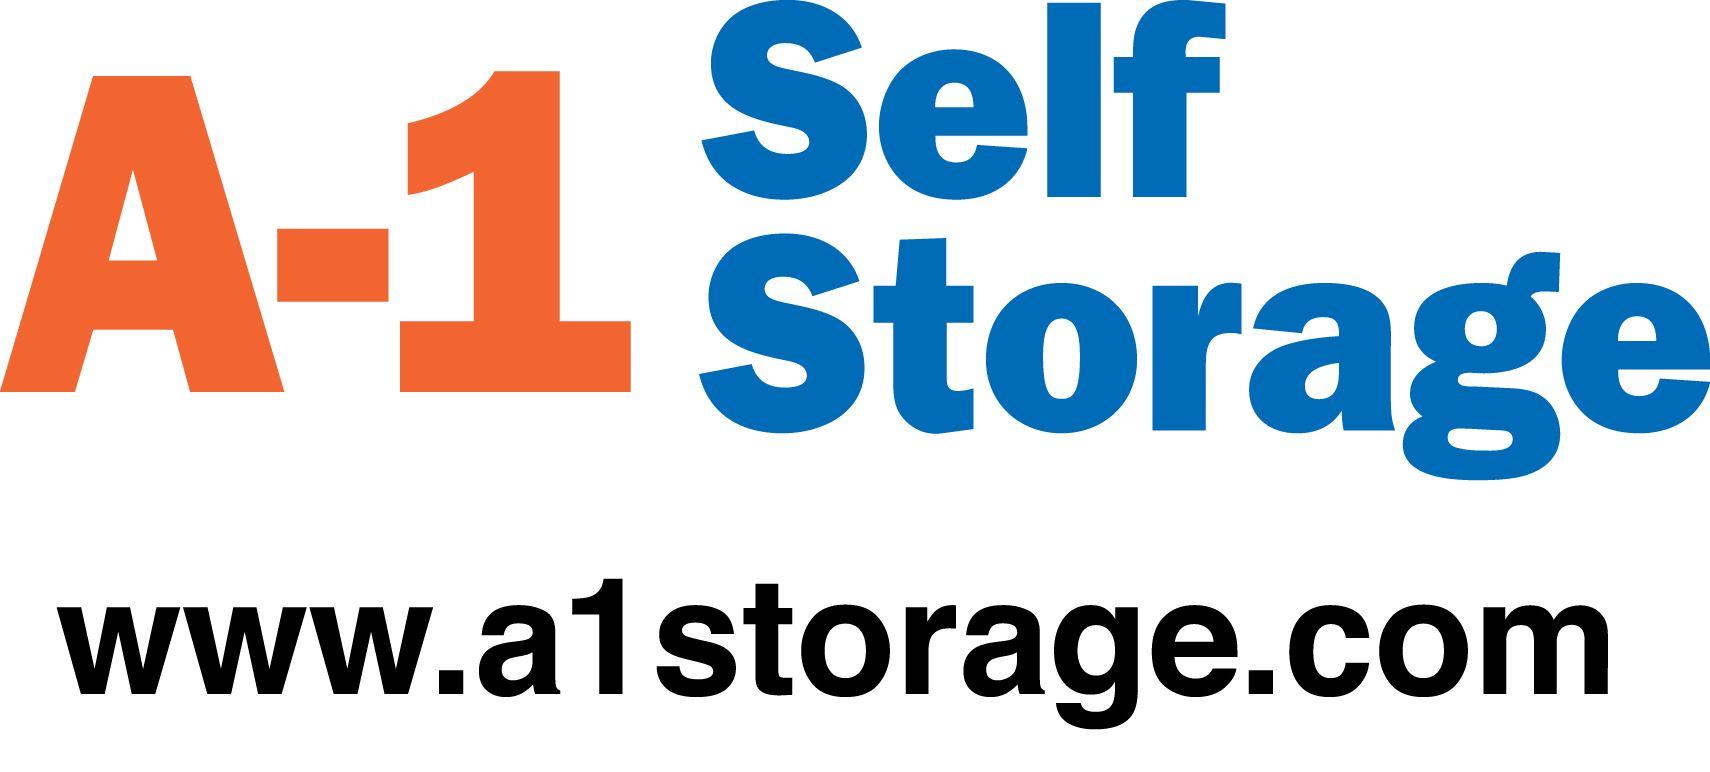 California Self Storage Association - Caster Properties, Inc